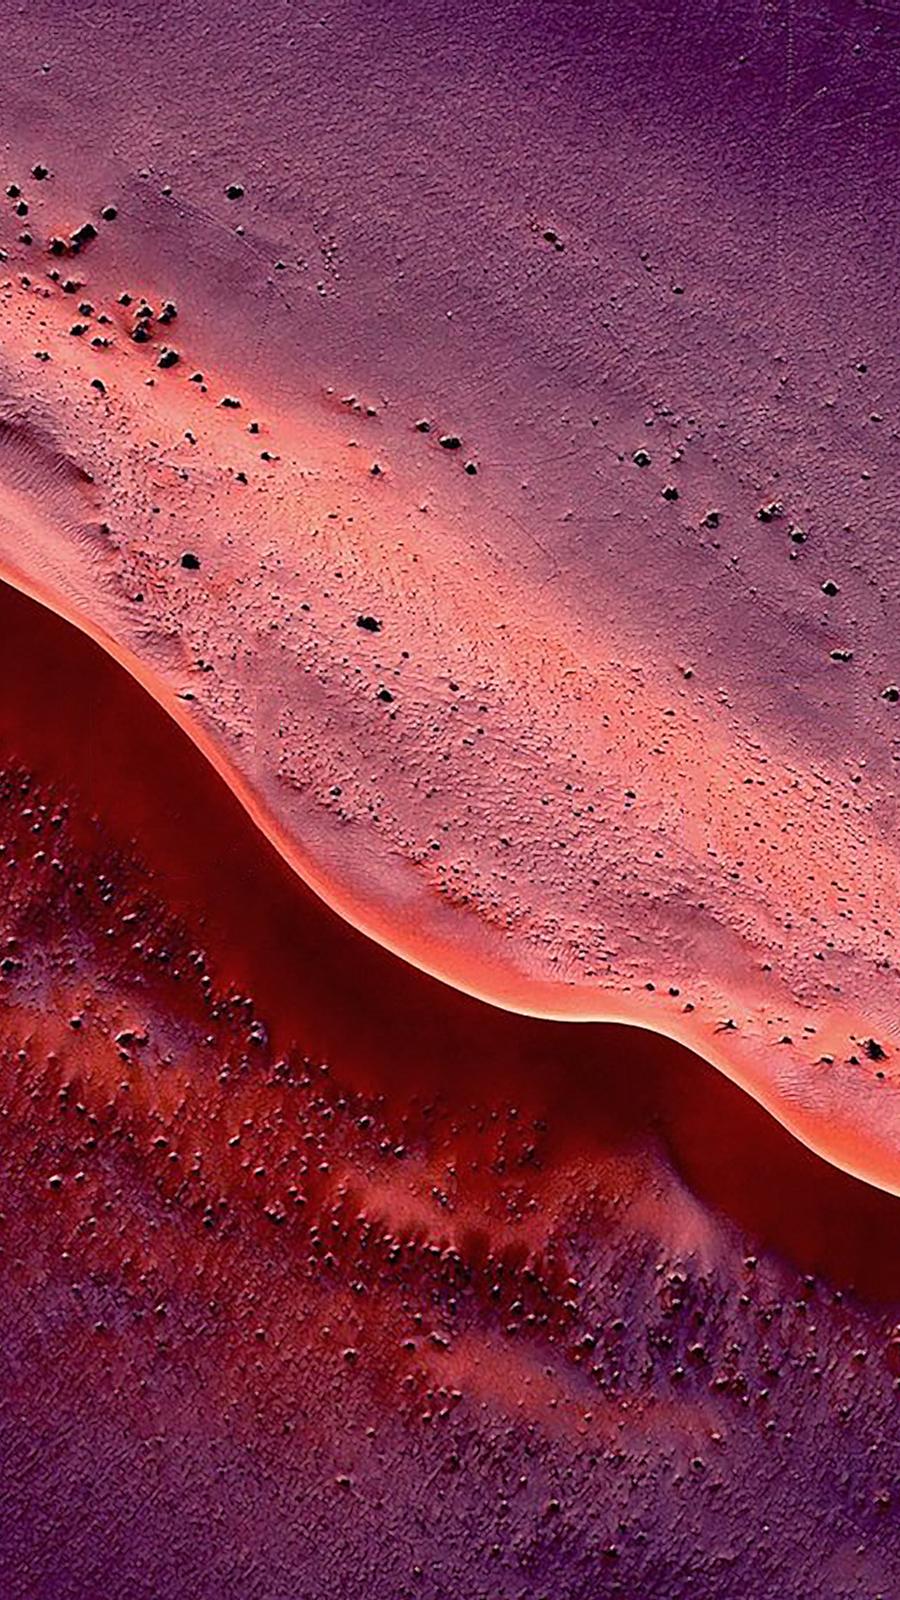 Dune 2020 Wallpapers without logo in 2020 Dune art Wallpaper 900x1600